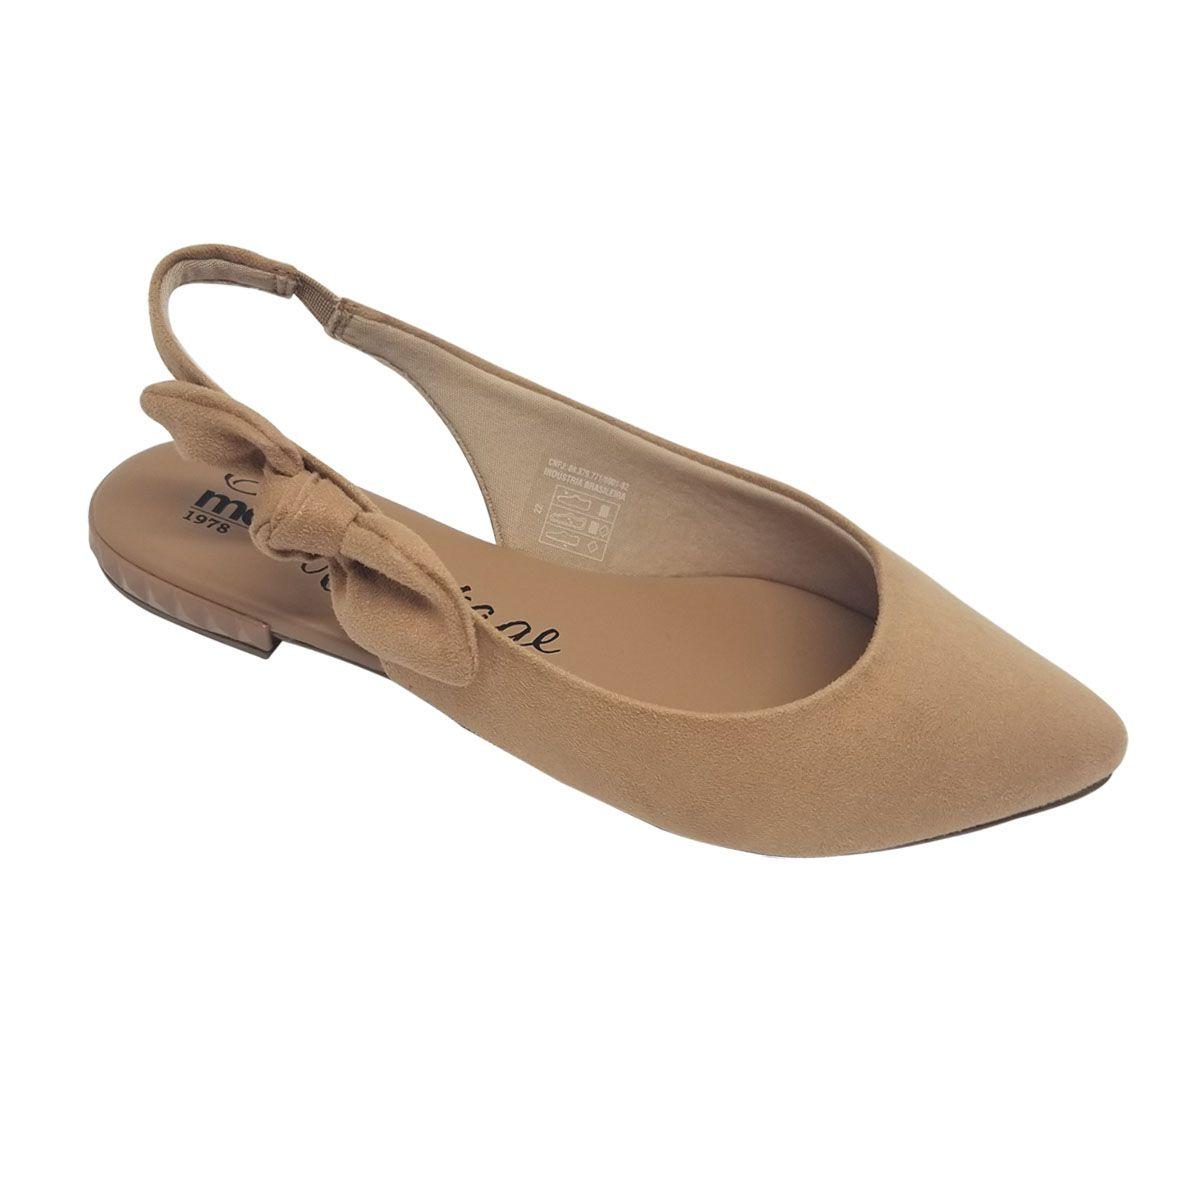 Sapato Moleca Nude Moleca Sapato Moleca Nude Dd Shoes Loja